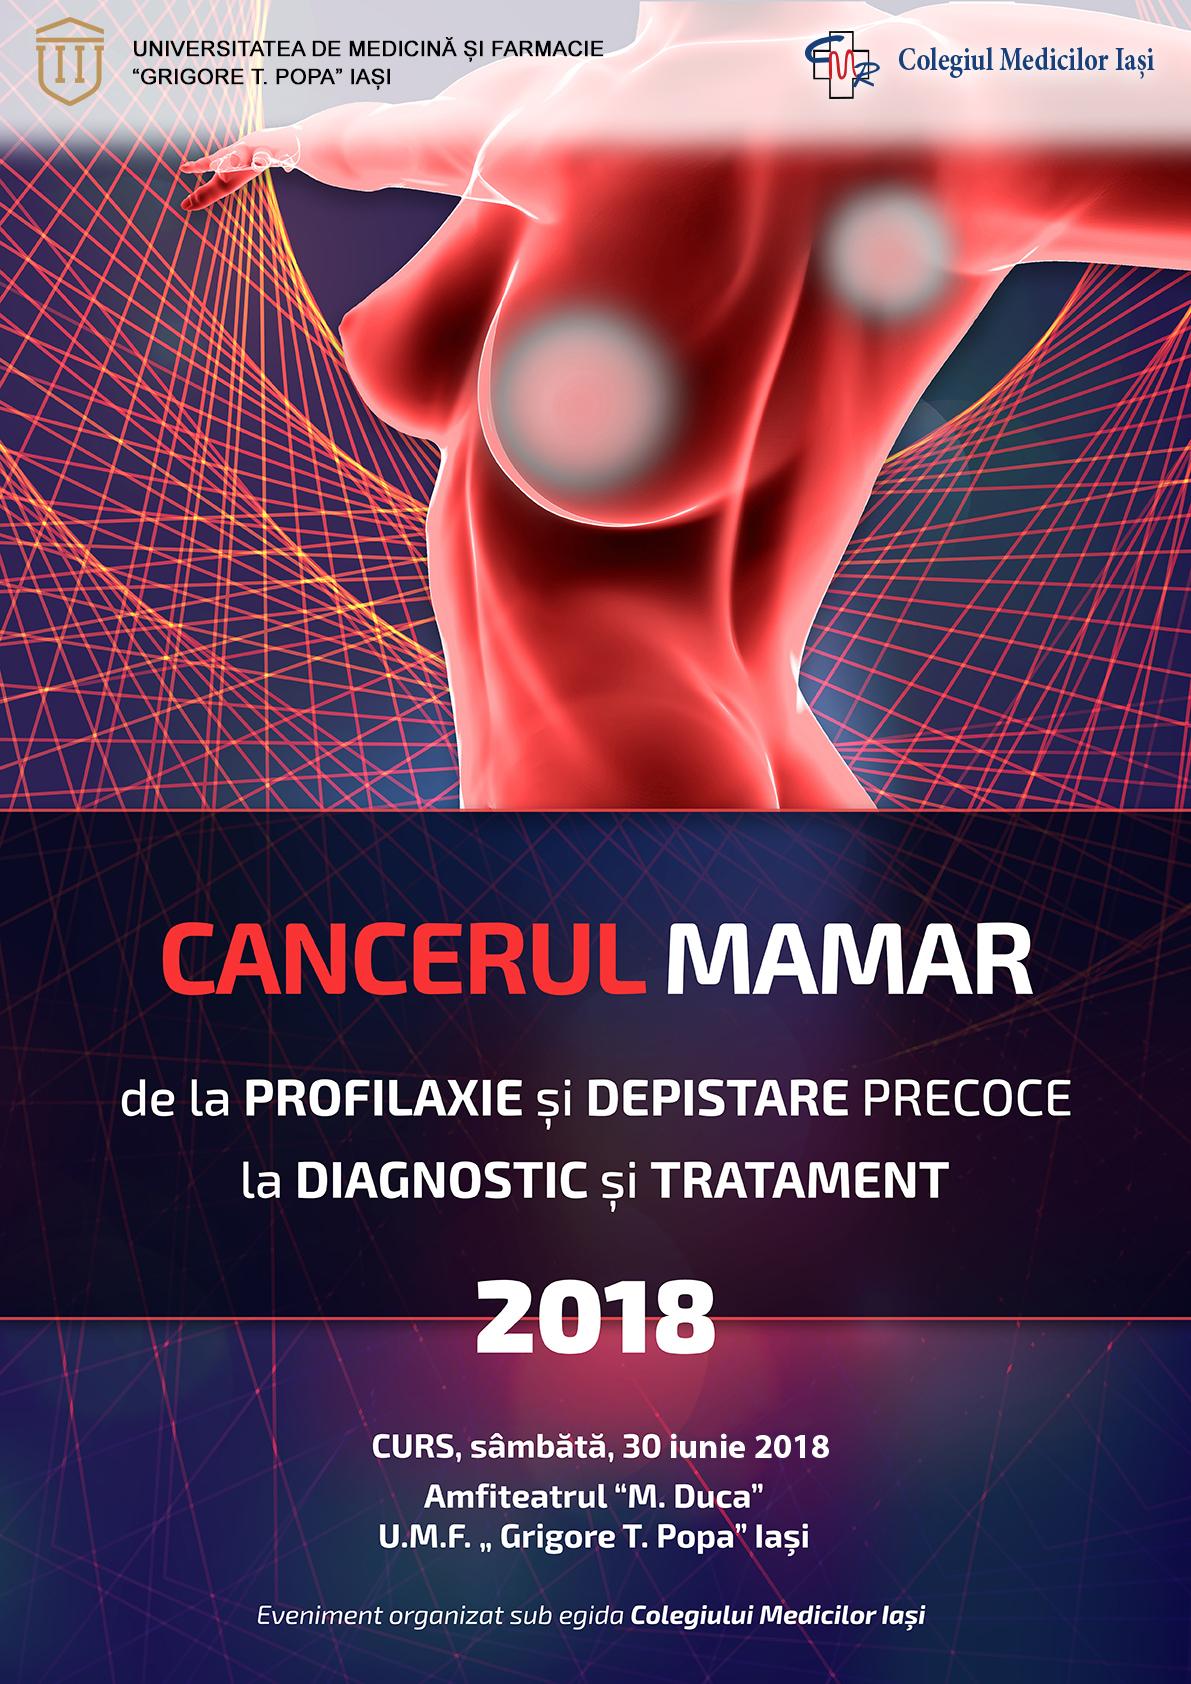 cancer mamar depistare